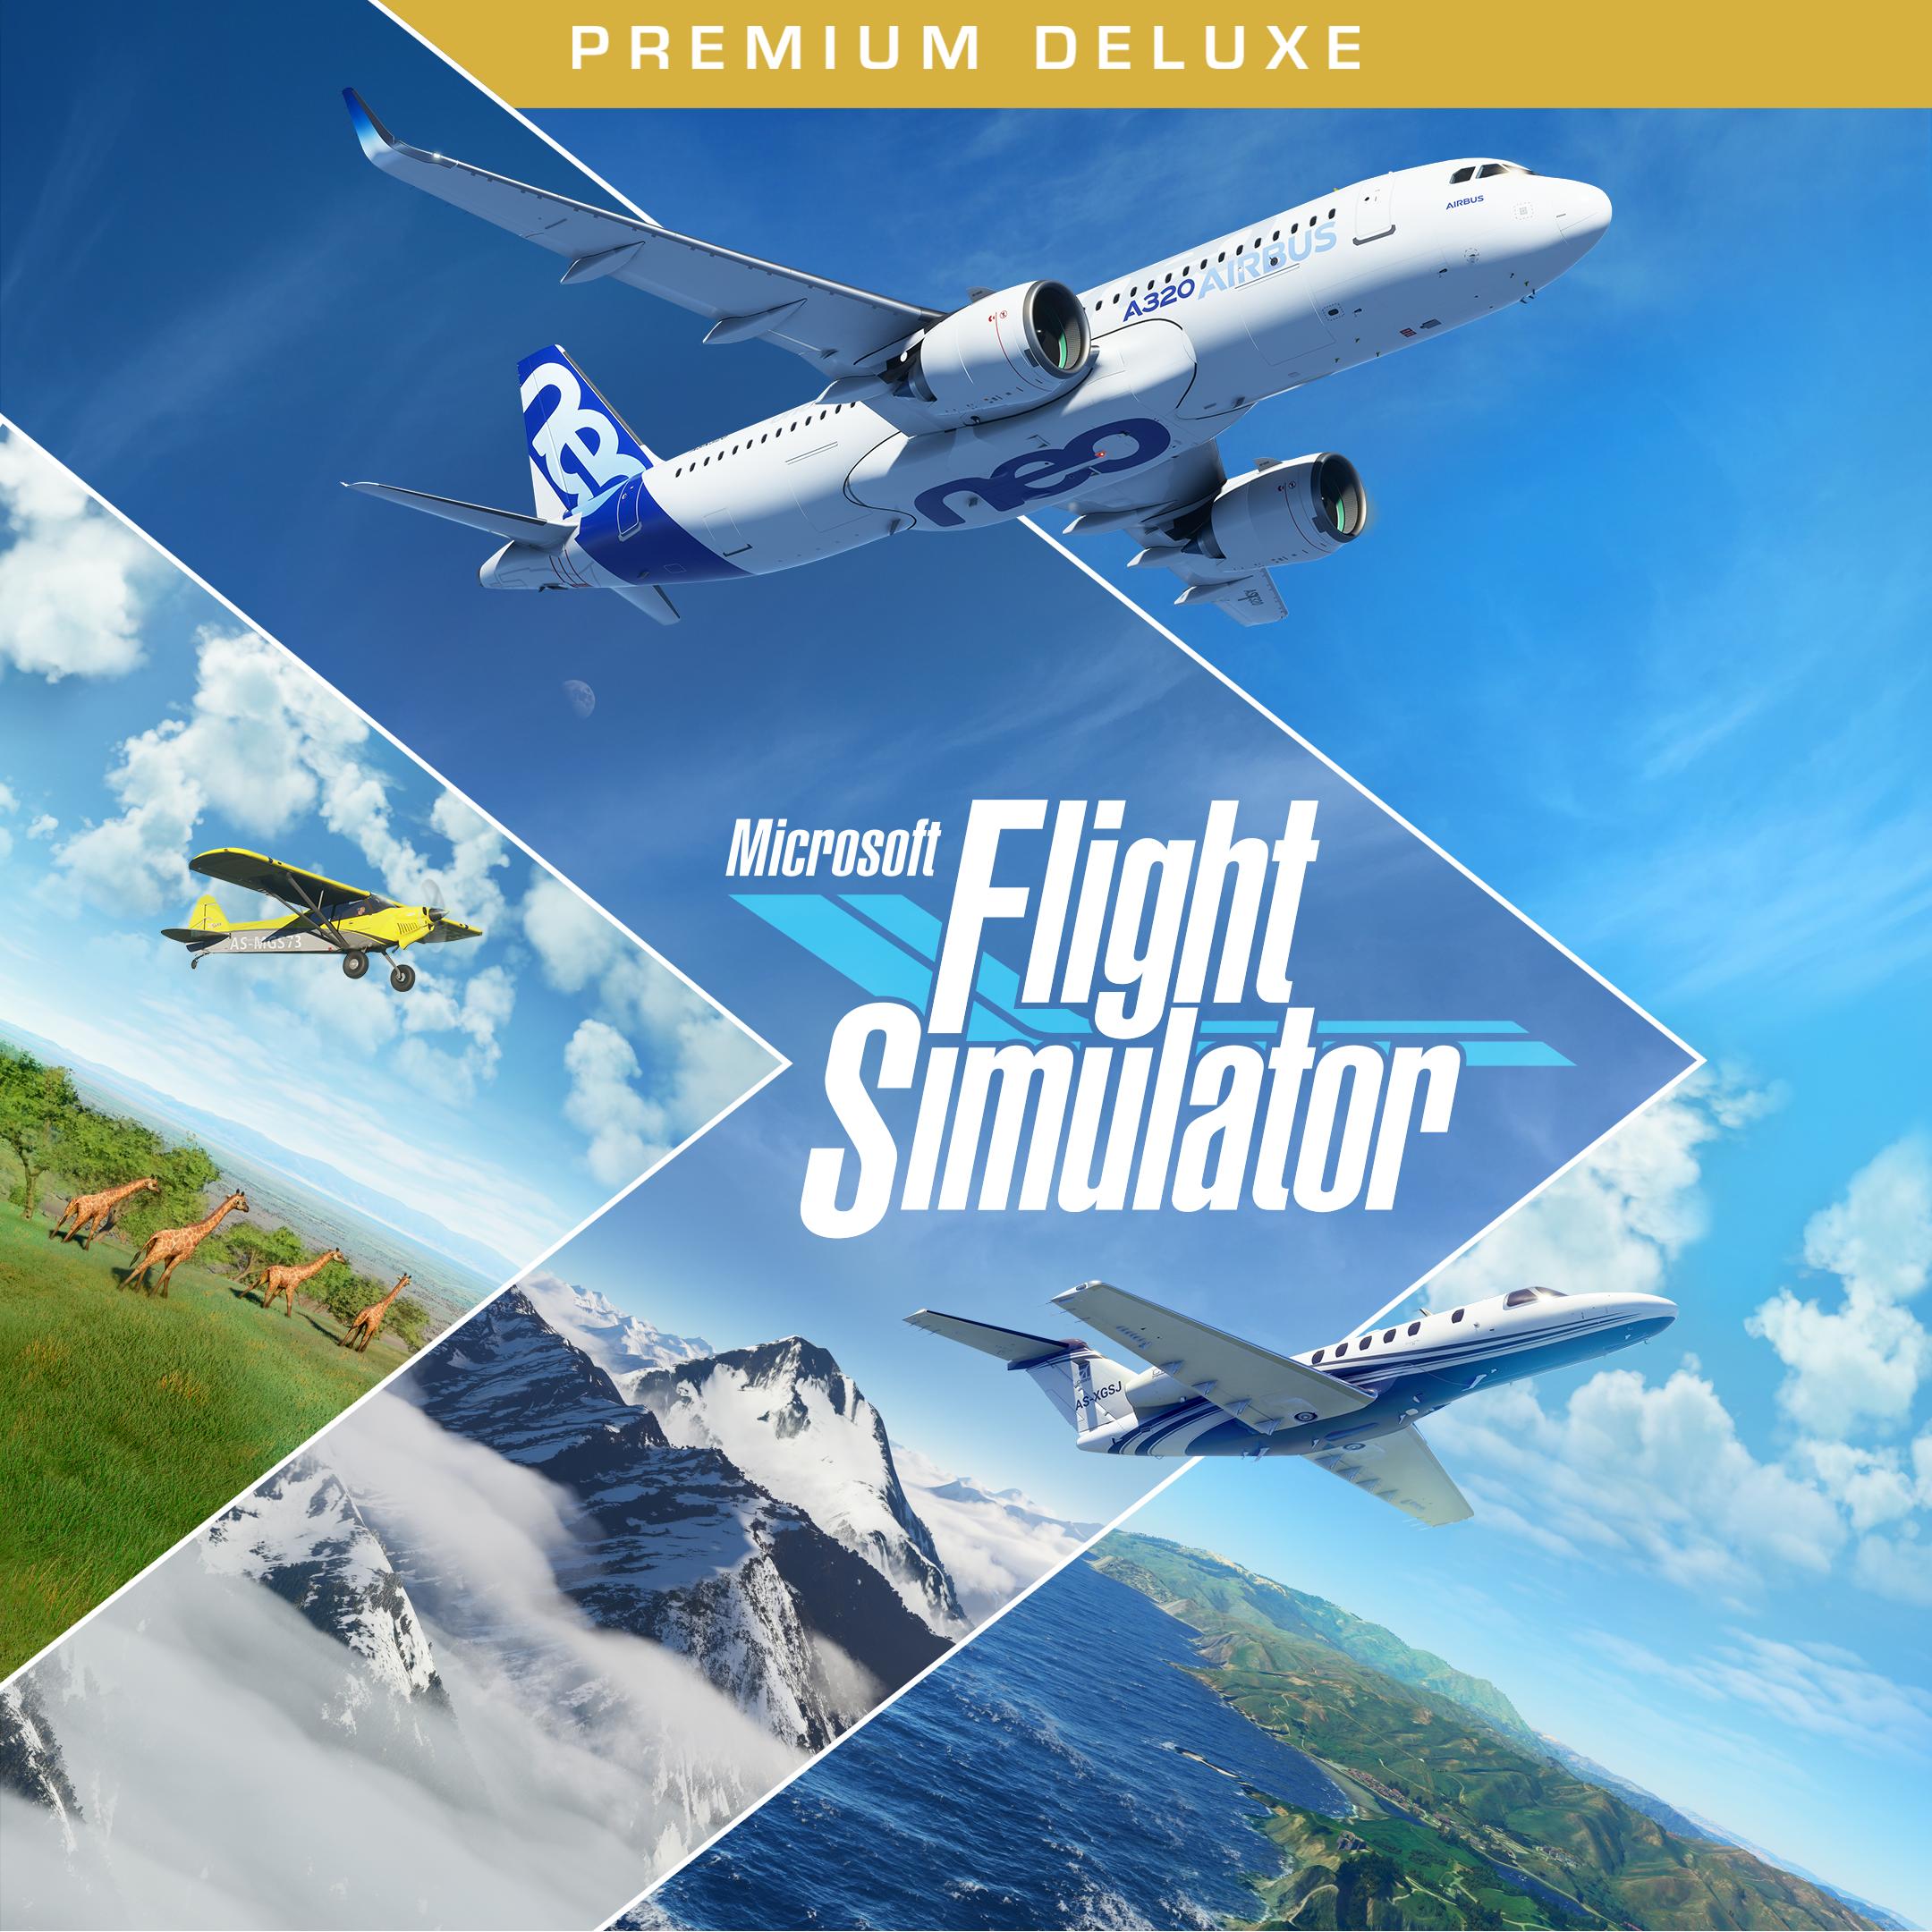 Buy Microsoft Flight Simulator Premium Edition for Xbox Series X|S